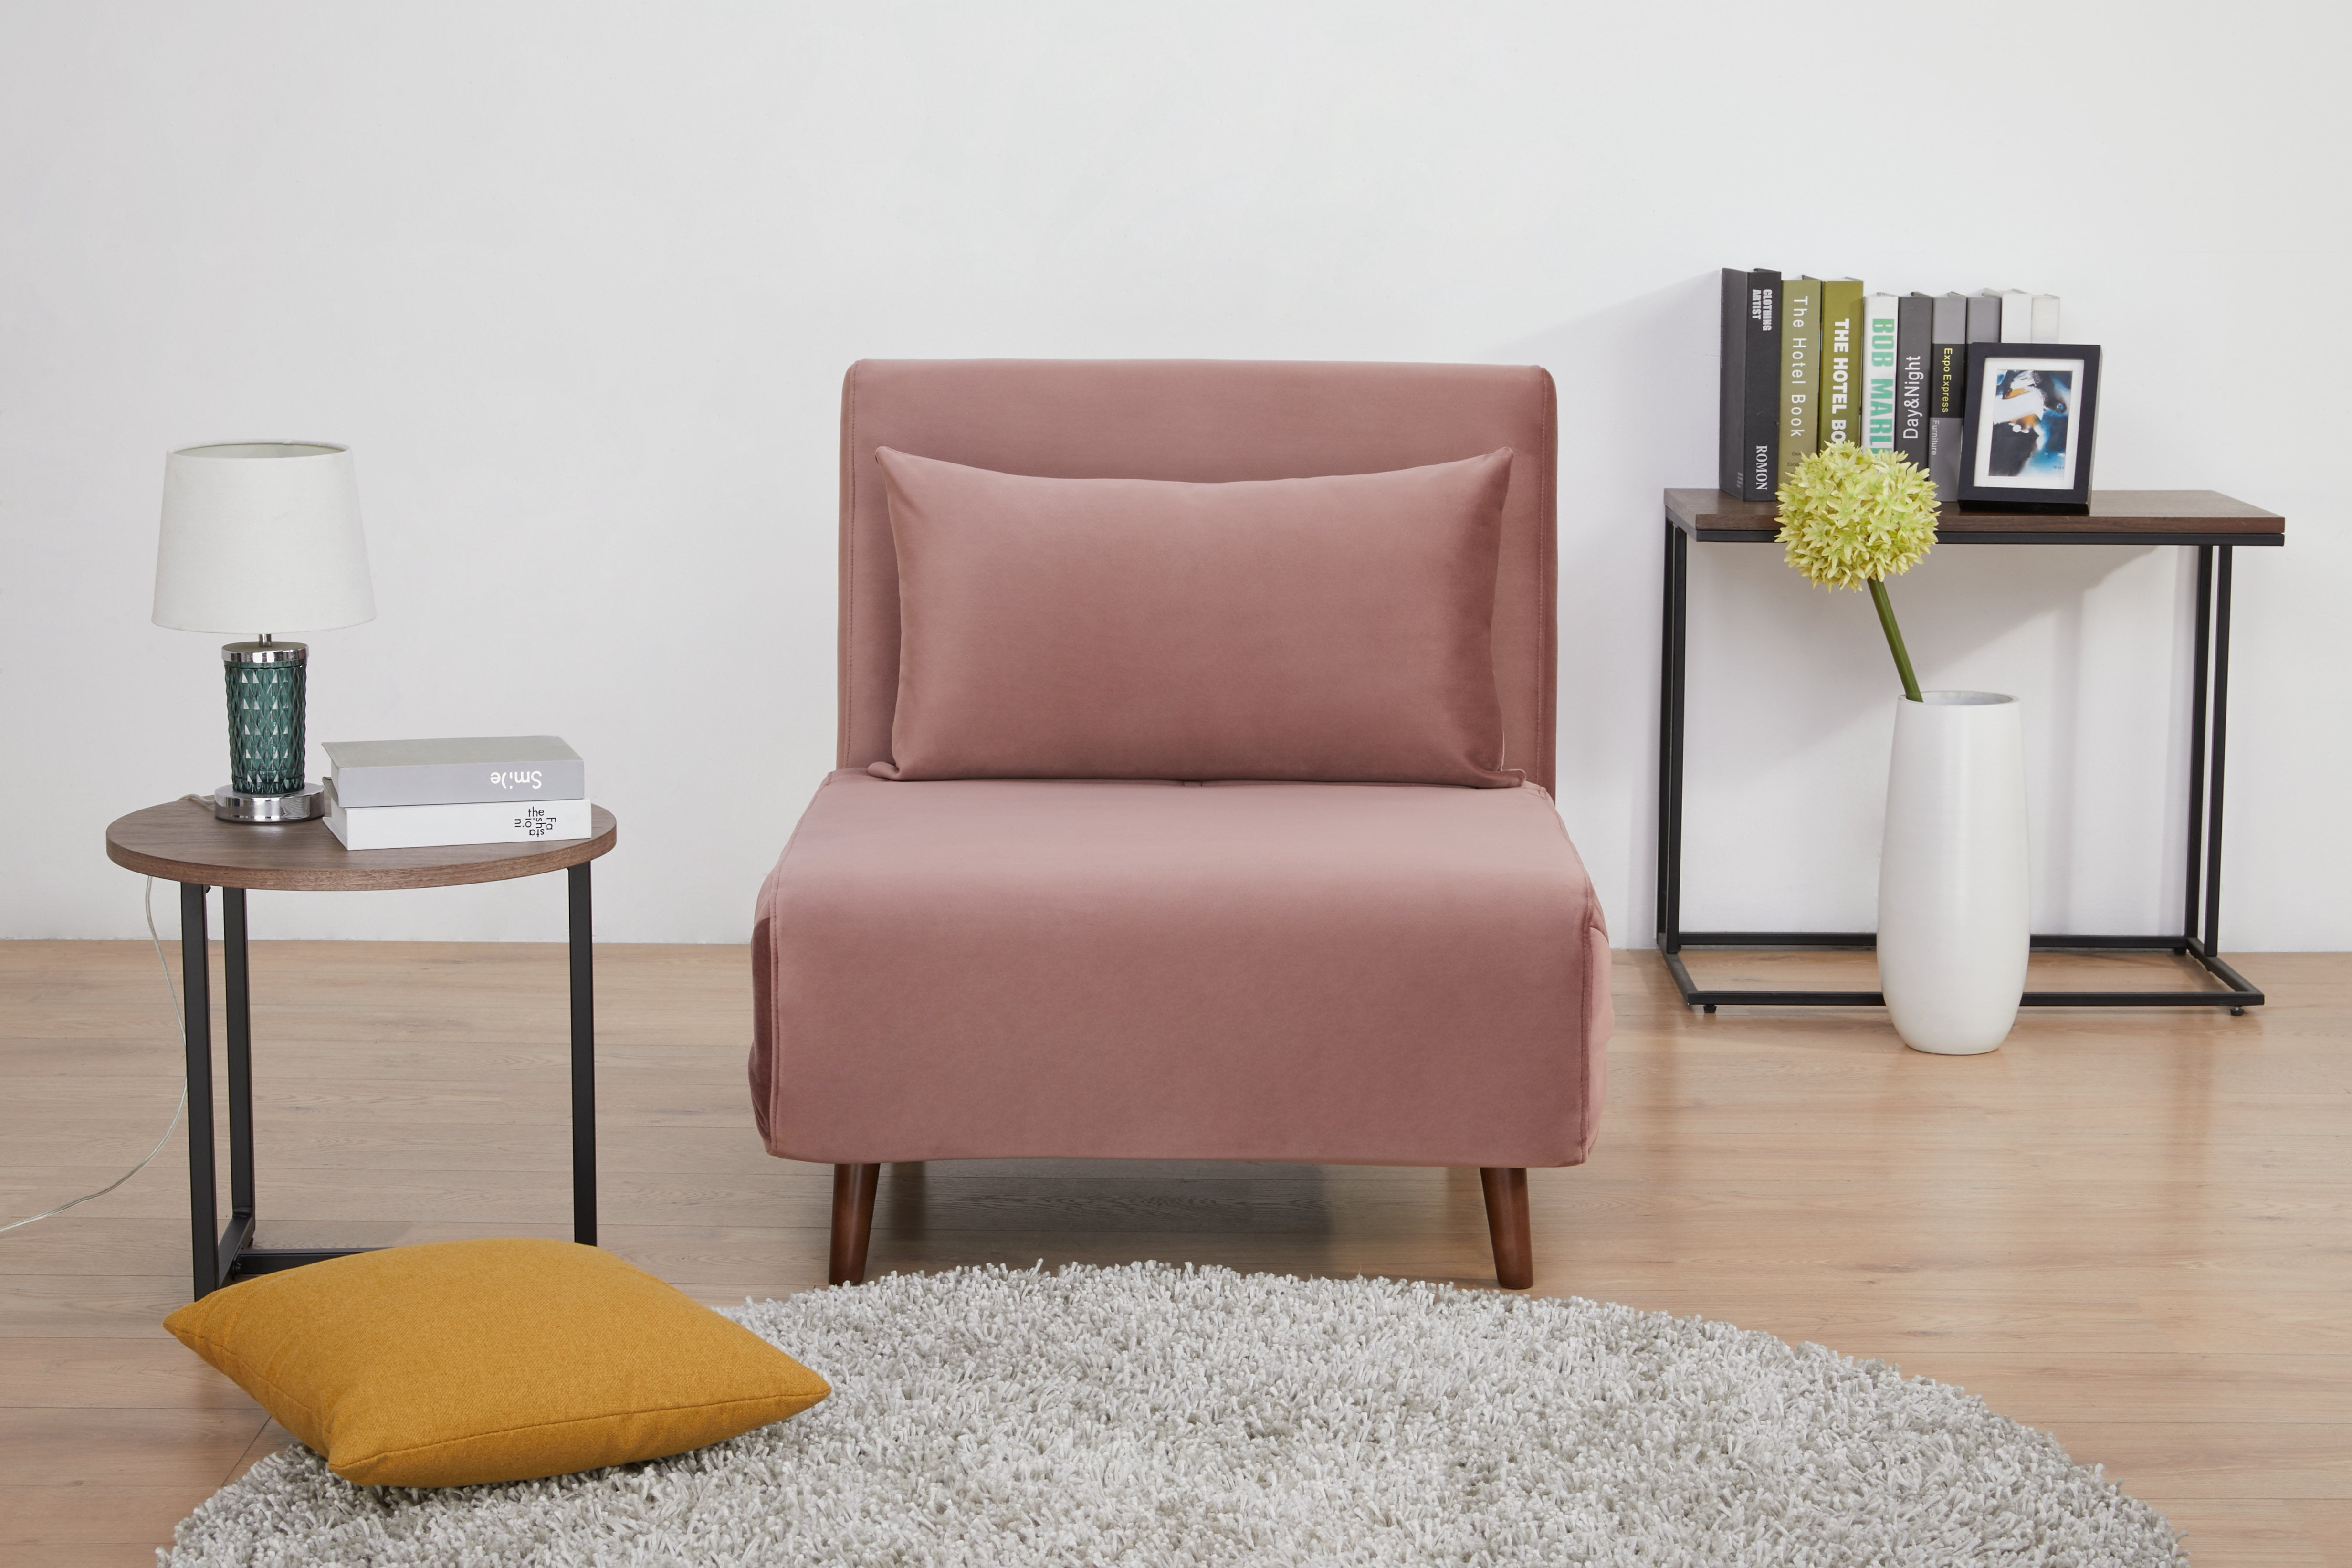 A D Home Tustin Convertible Chair Blush Pink Velvet Walmart Com Walmart Com